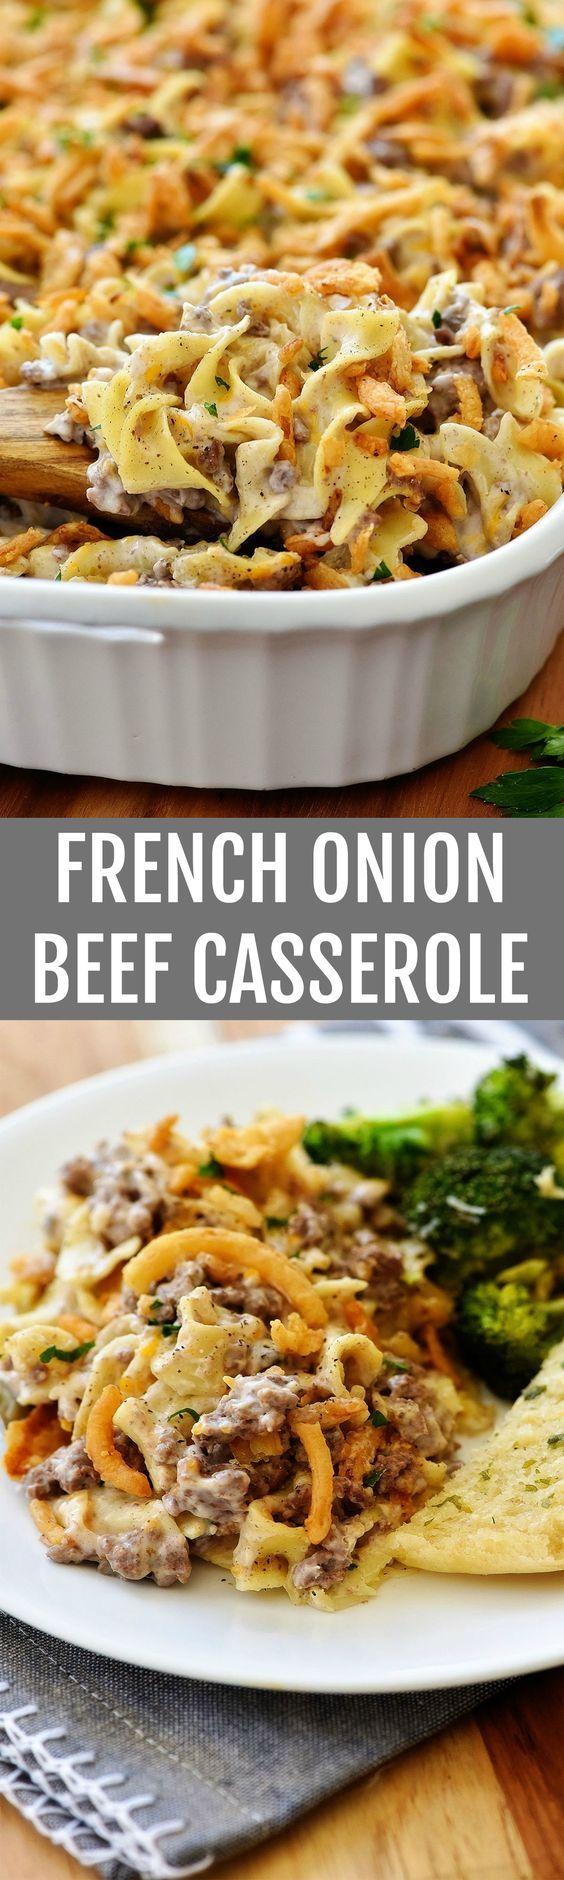 FRENCH ONION BEEF CASSEROLE